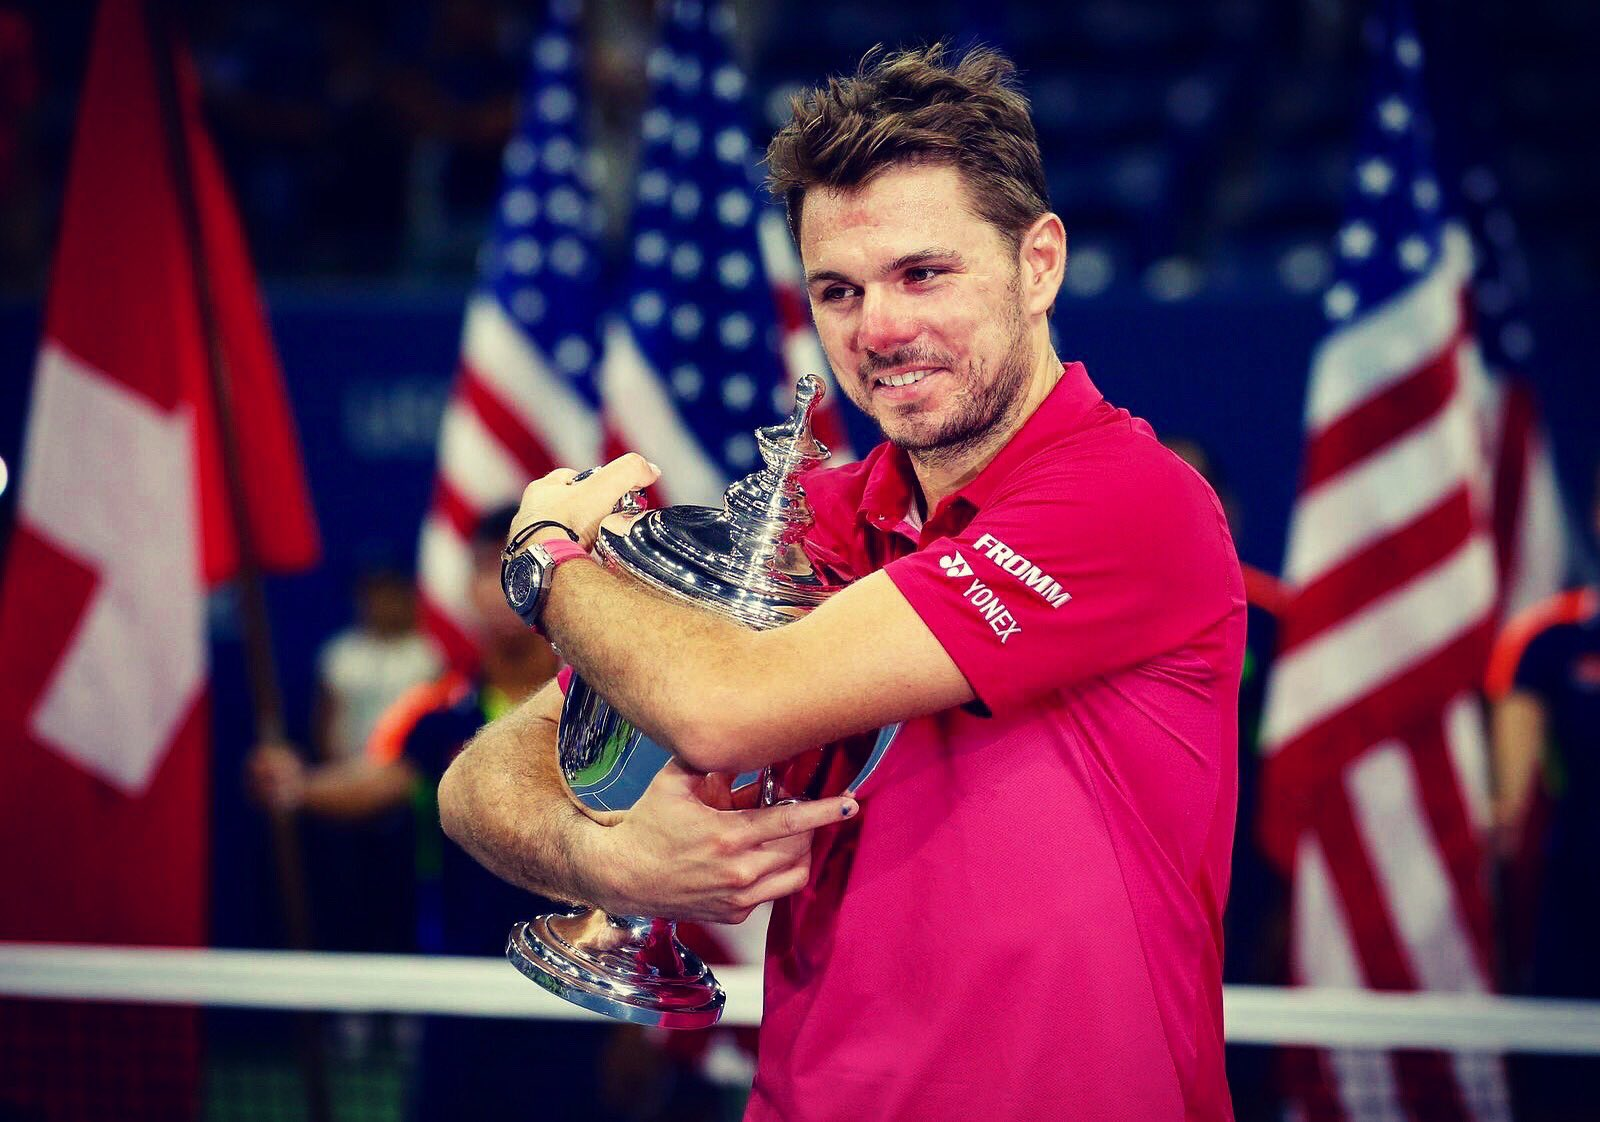 So special to add a new ゚マニ !!! @usopen #newyork #trophy #stanimal ゚ᄂヤ゚ルト゚リᄆ゚リᄚ゚リᆰ゚マテ゚マᄏ゚ムパマᄏ゚メᆰ゚マᄏ゚ムノ゚マᄏ゚リマ゚マニ゚ホパホノ゚ヘᄎ゚ヘᄒ゚ヘᄒ゚ヘᄒ゚ヘᄒ゚ミᄏ゚ミᄐ゚リリ¬ンᄂᄌマ https://t.co/xKHTt0I11Z